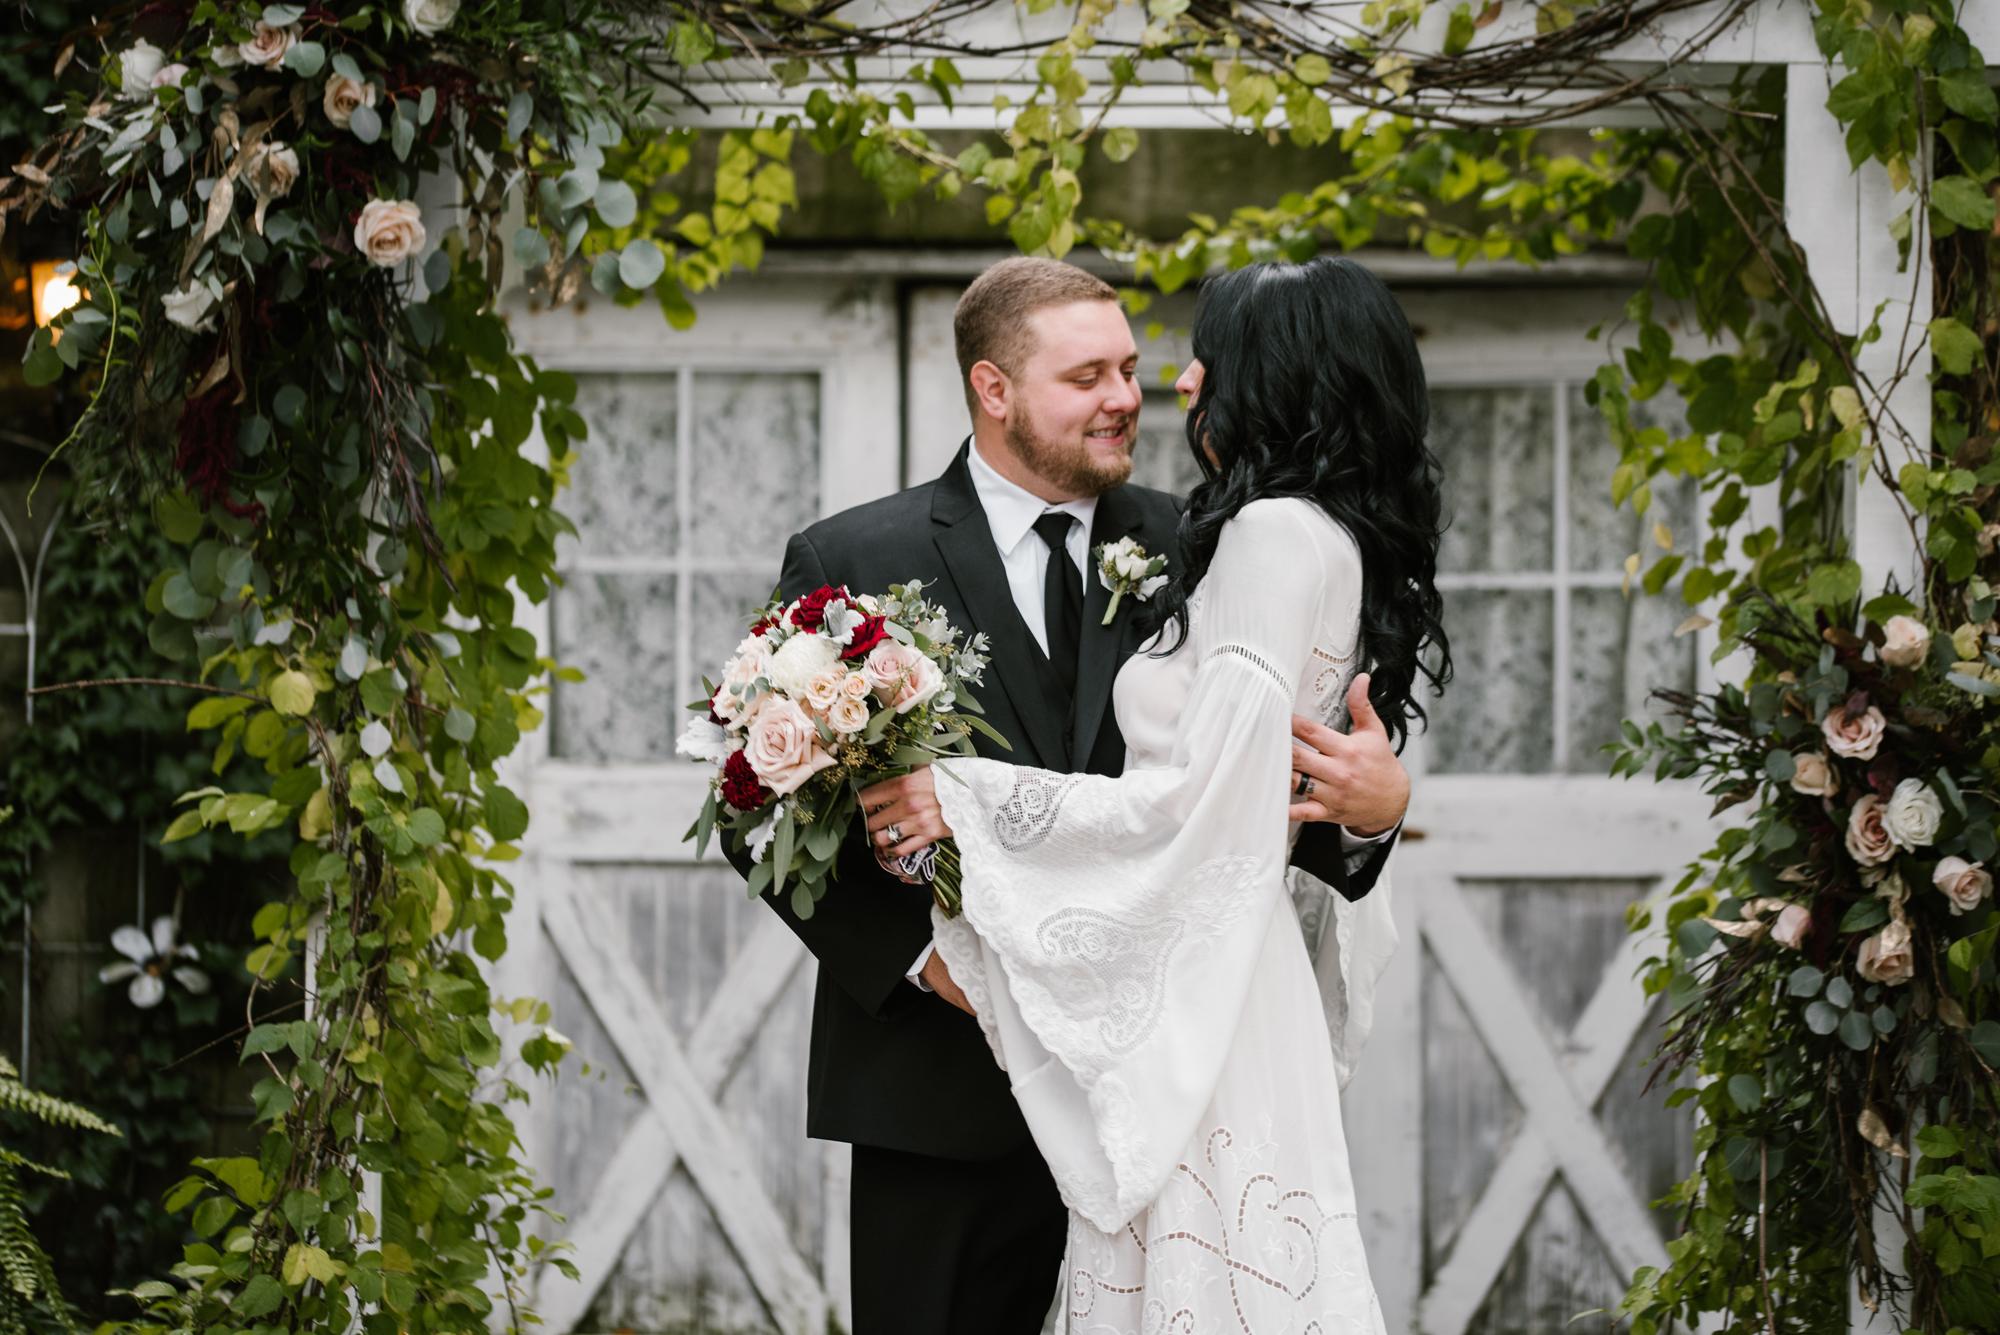 blue-dress-barn-benton-harbor-michigan-fall-wedding-photographer (2).jpg